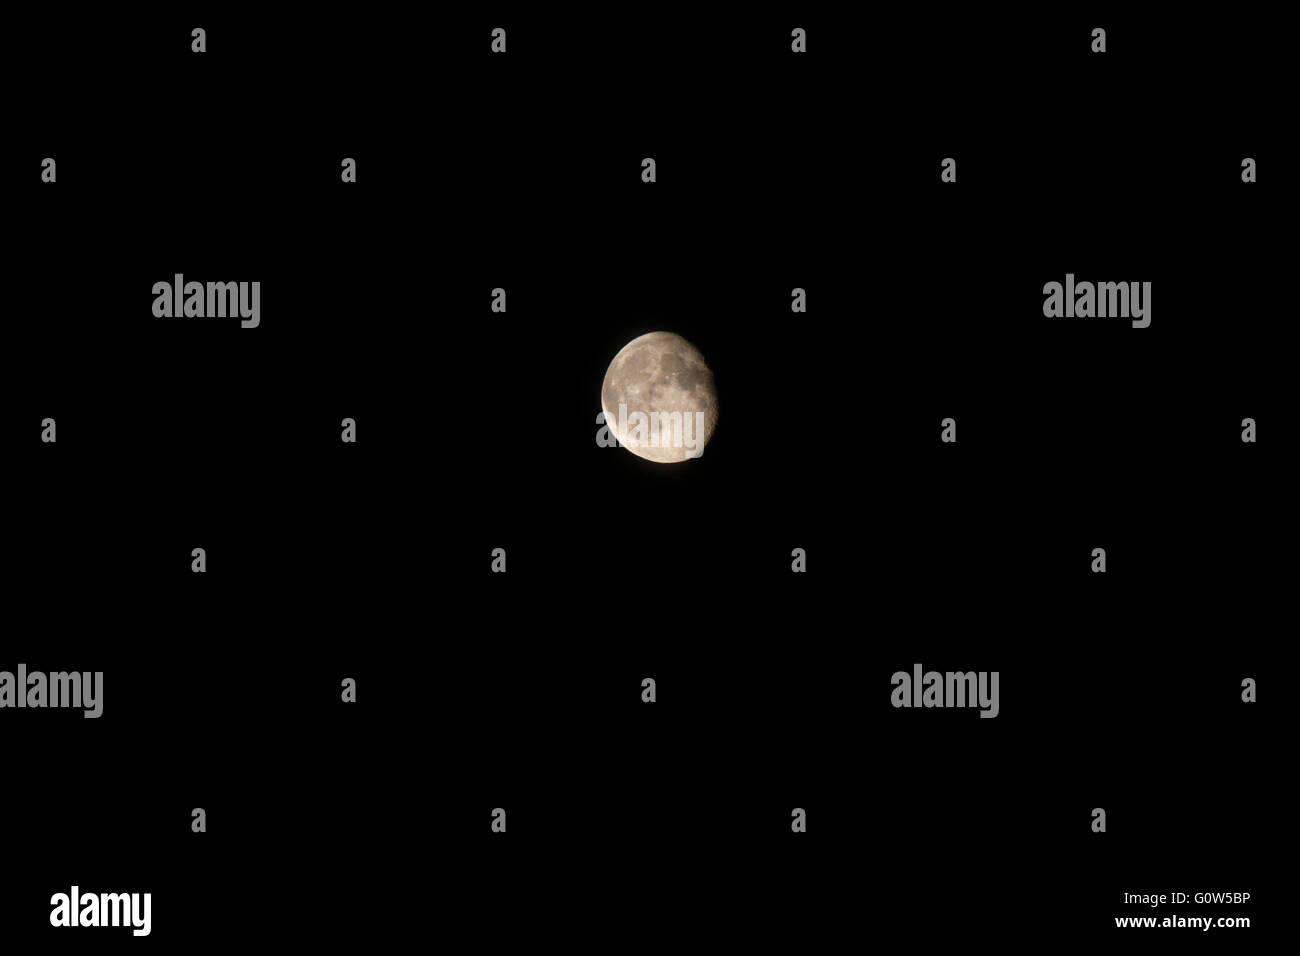 Mond moon. - Stock Image